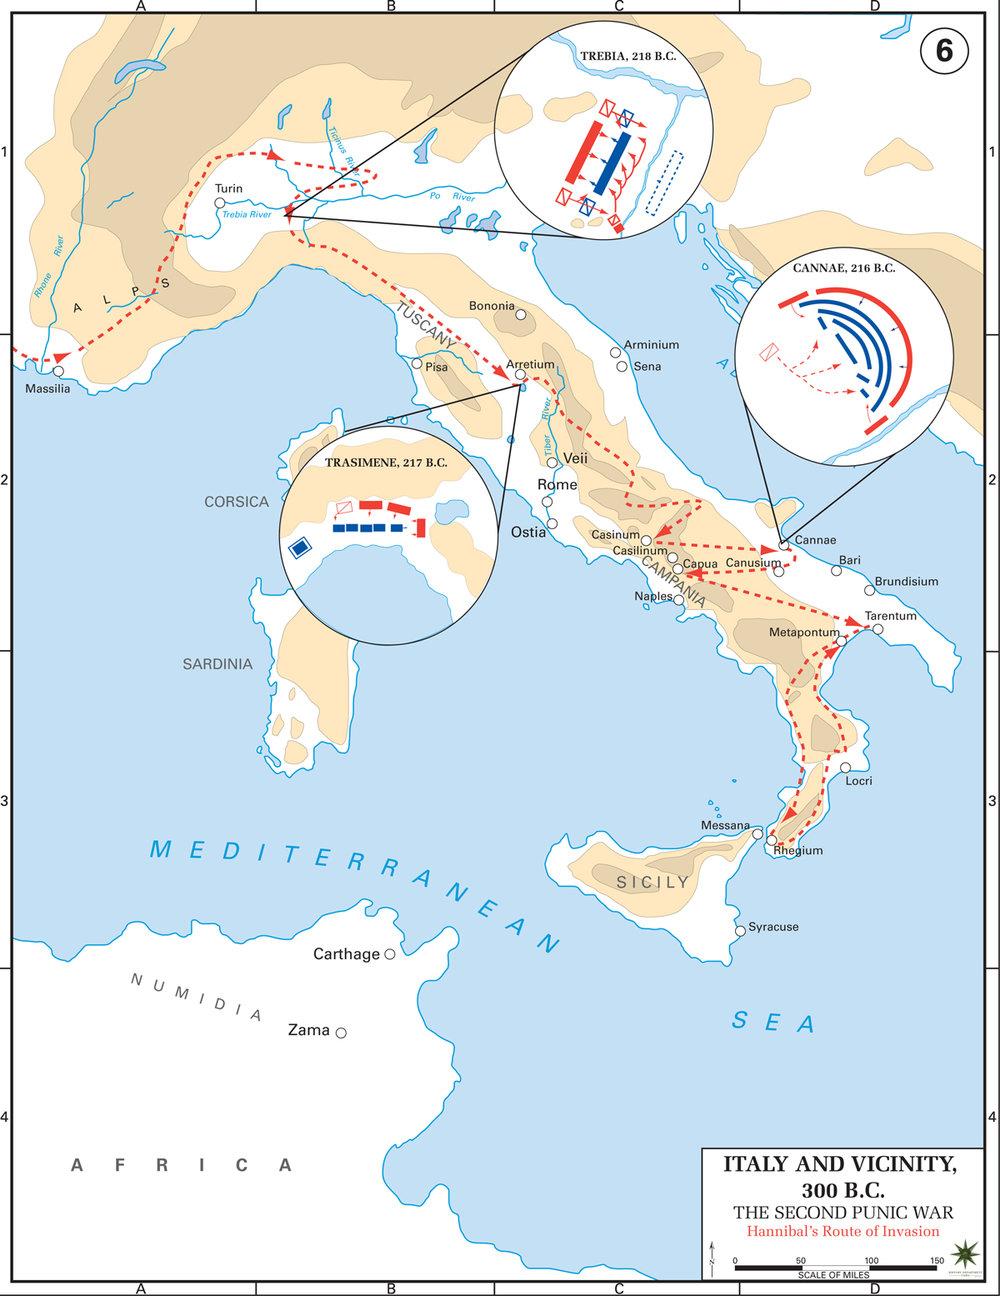 2nd punic war second hannbal italy map .jpg